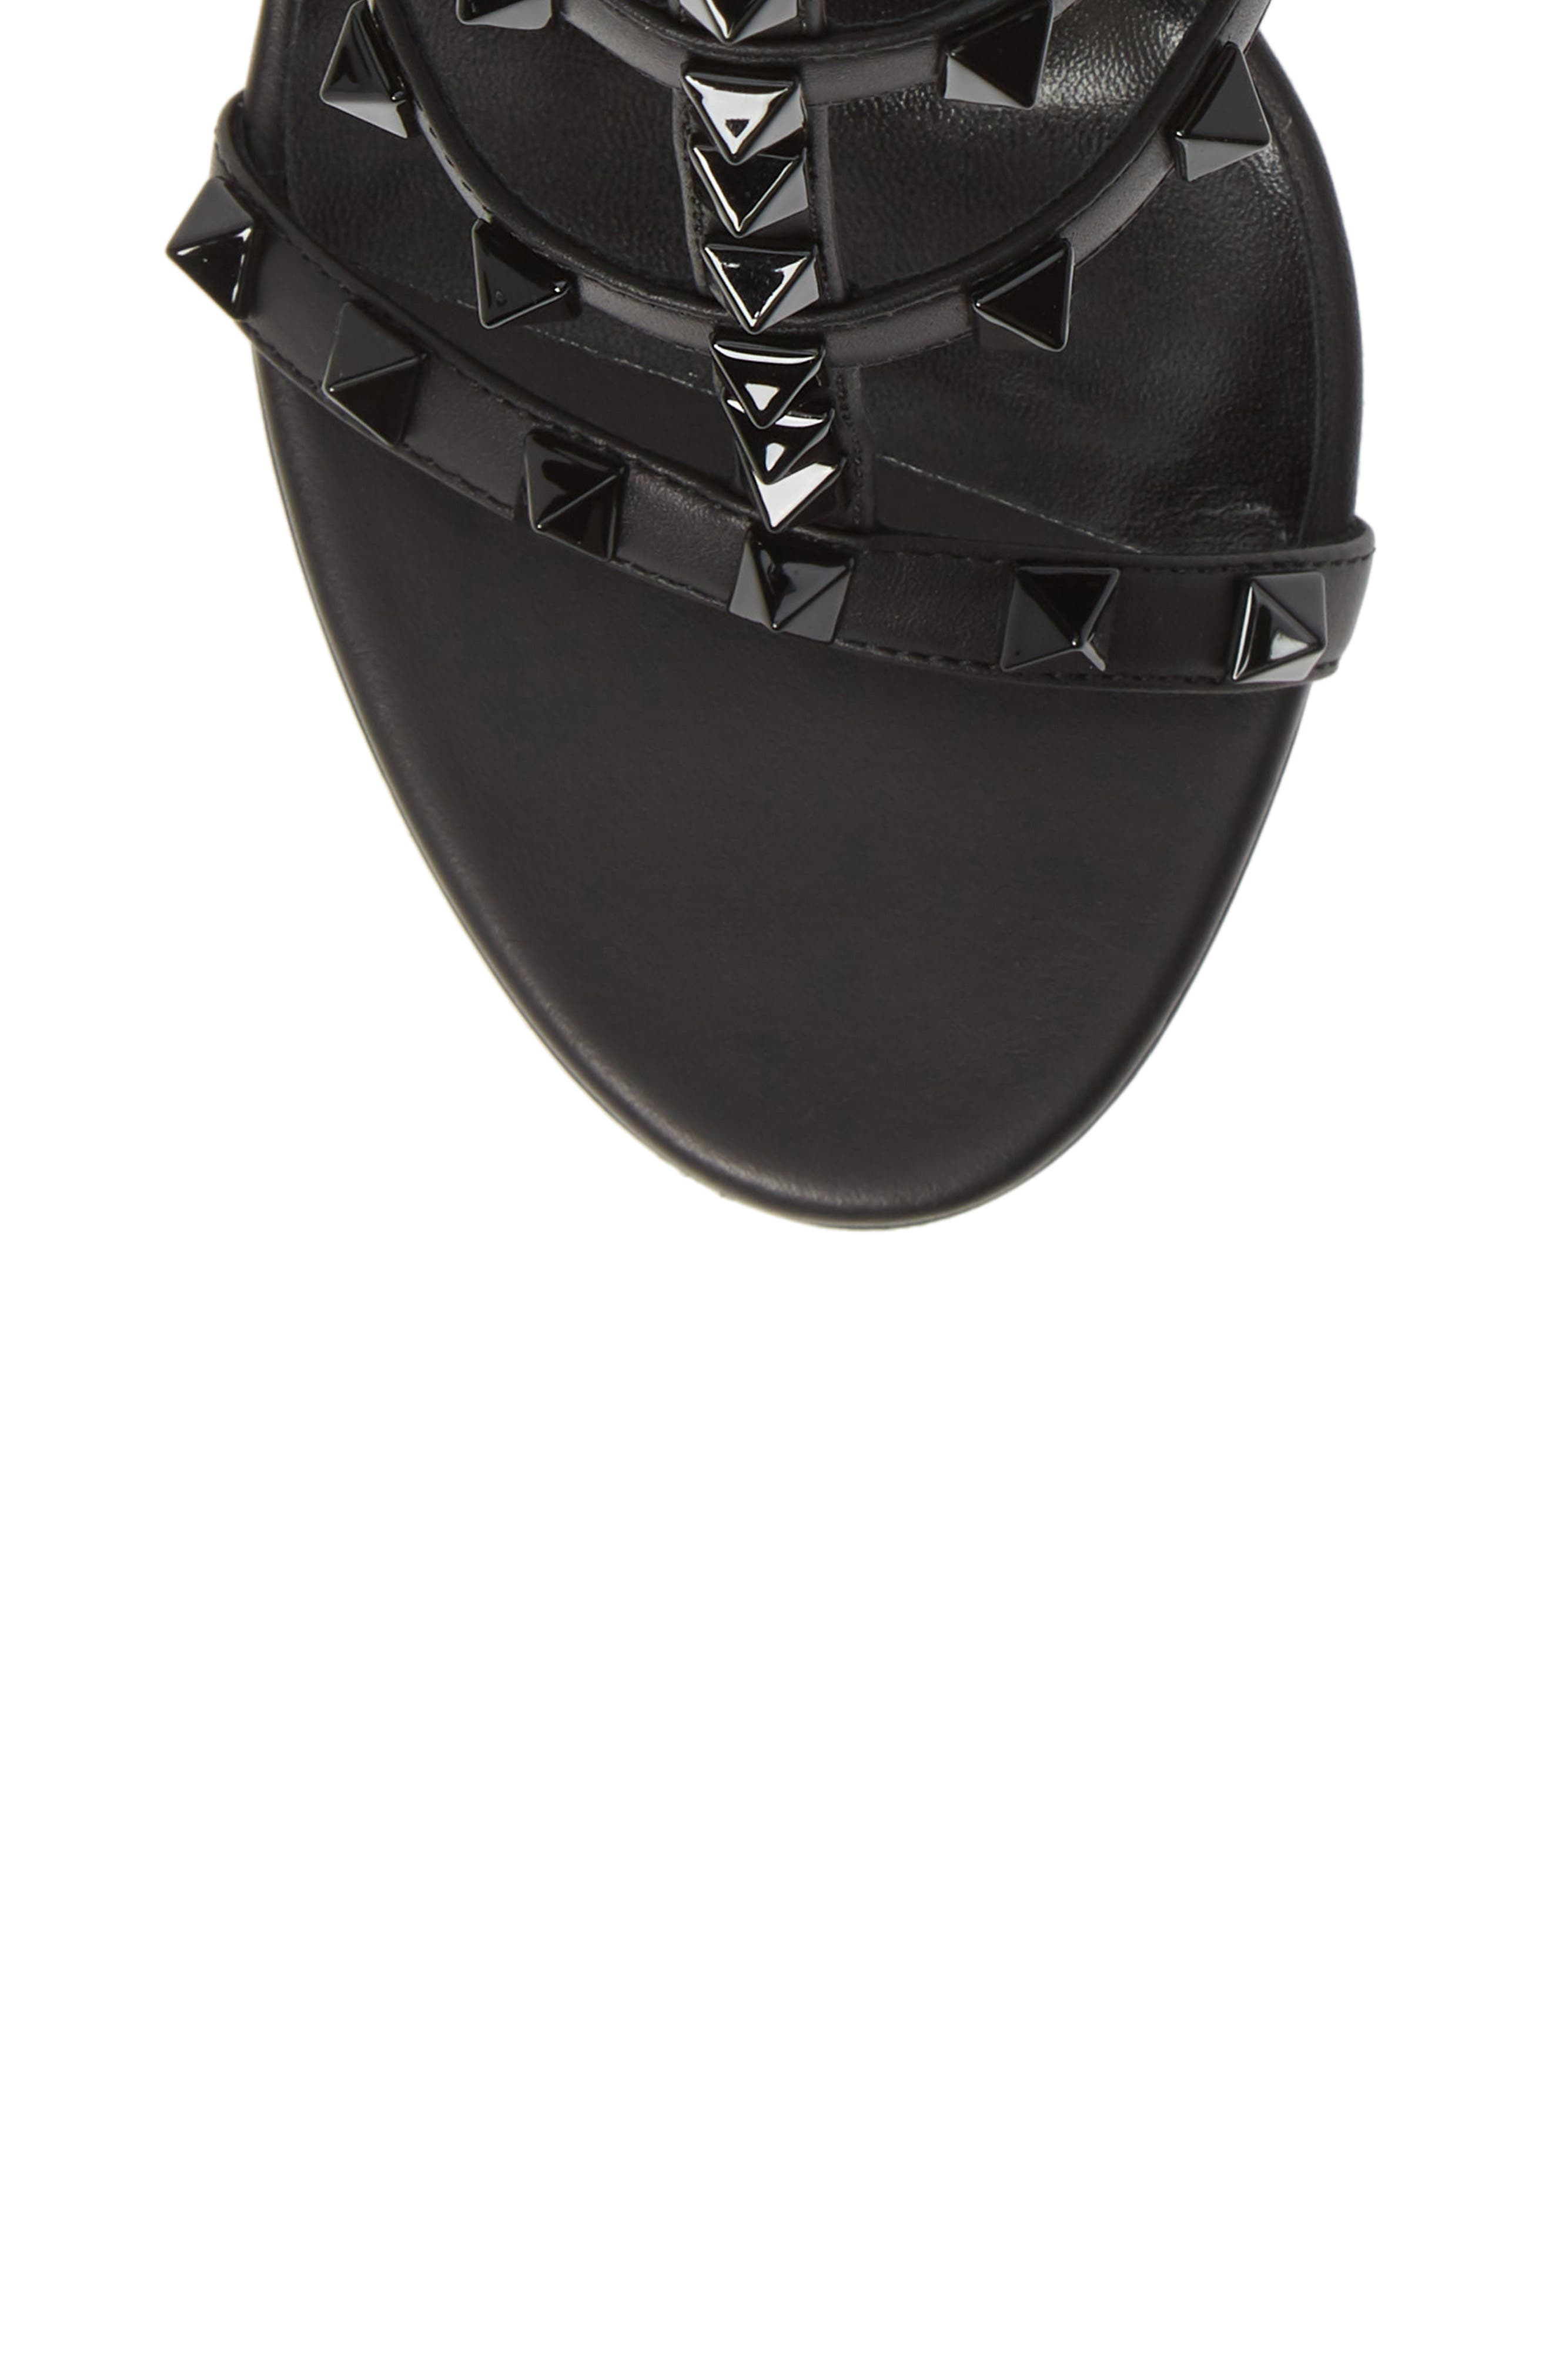 VALENTINO GARAVANI, Rockstud T-Strap Sandal, Alternate thumbnail 5, color, BLACK